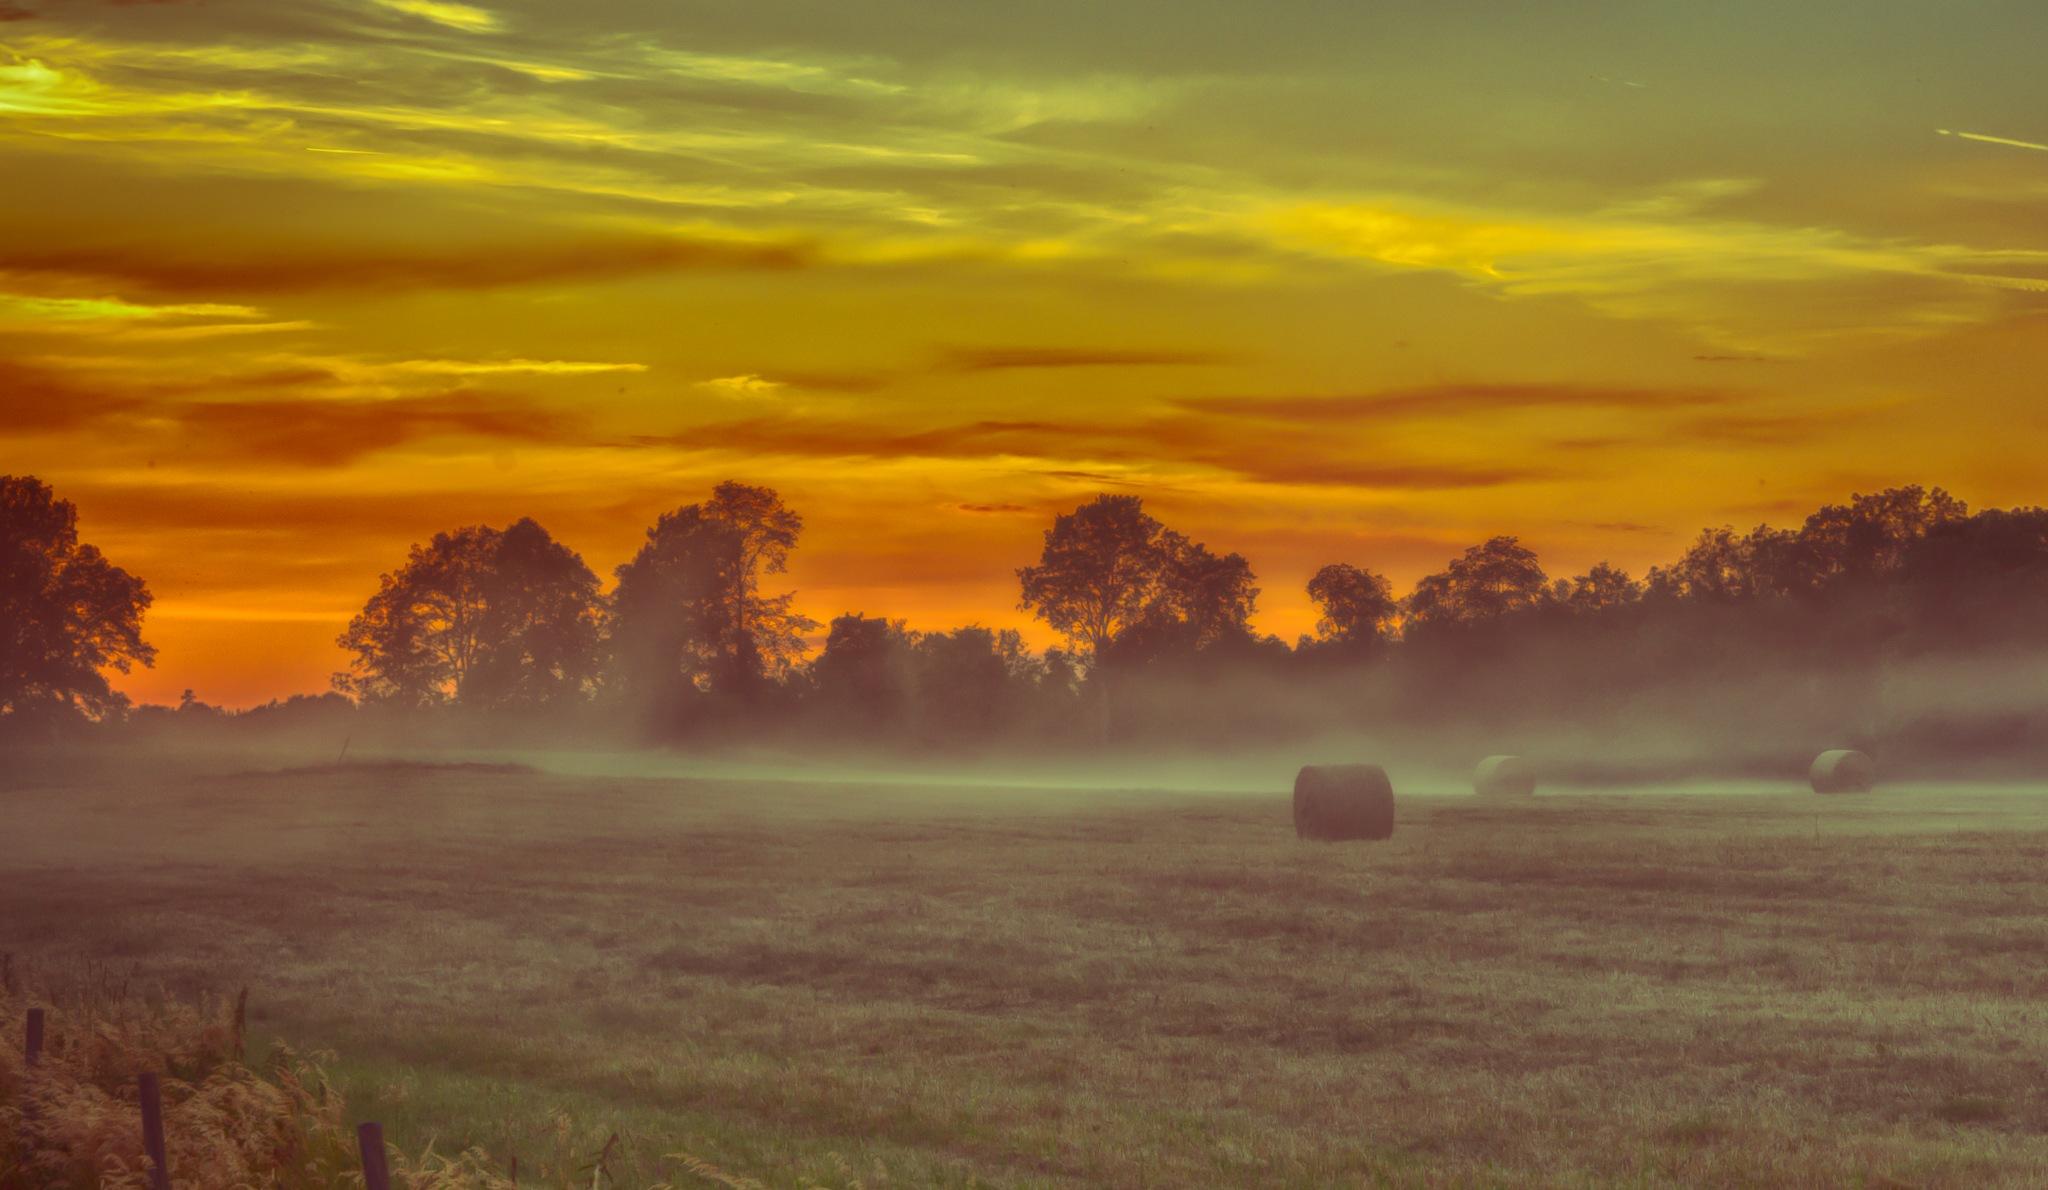 Hay in Mist at Sunset by carljan w carlsson